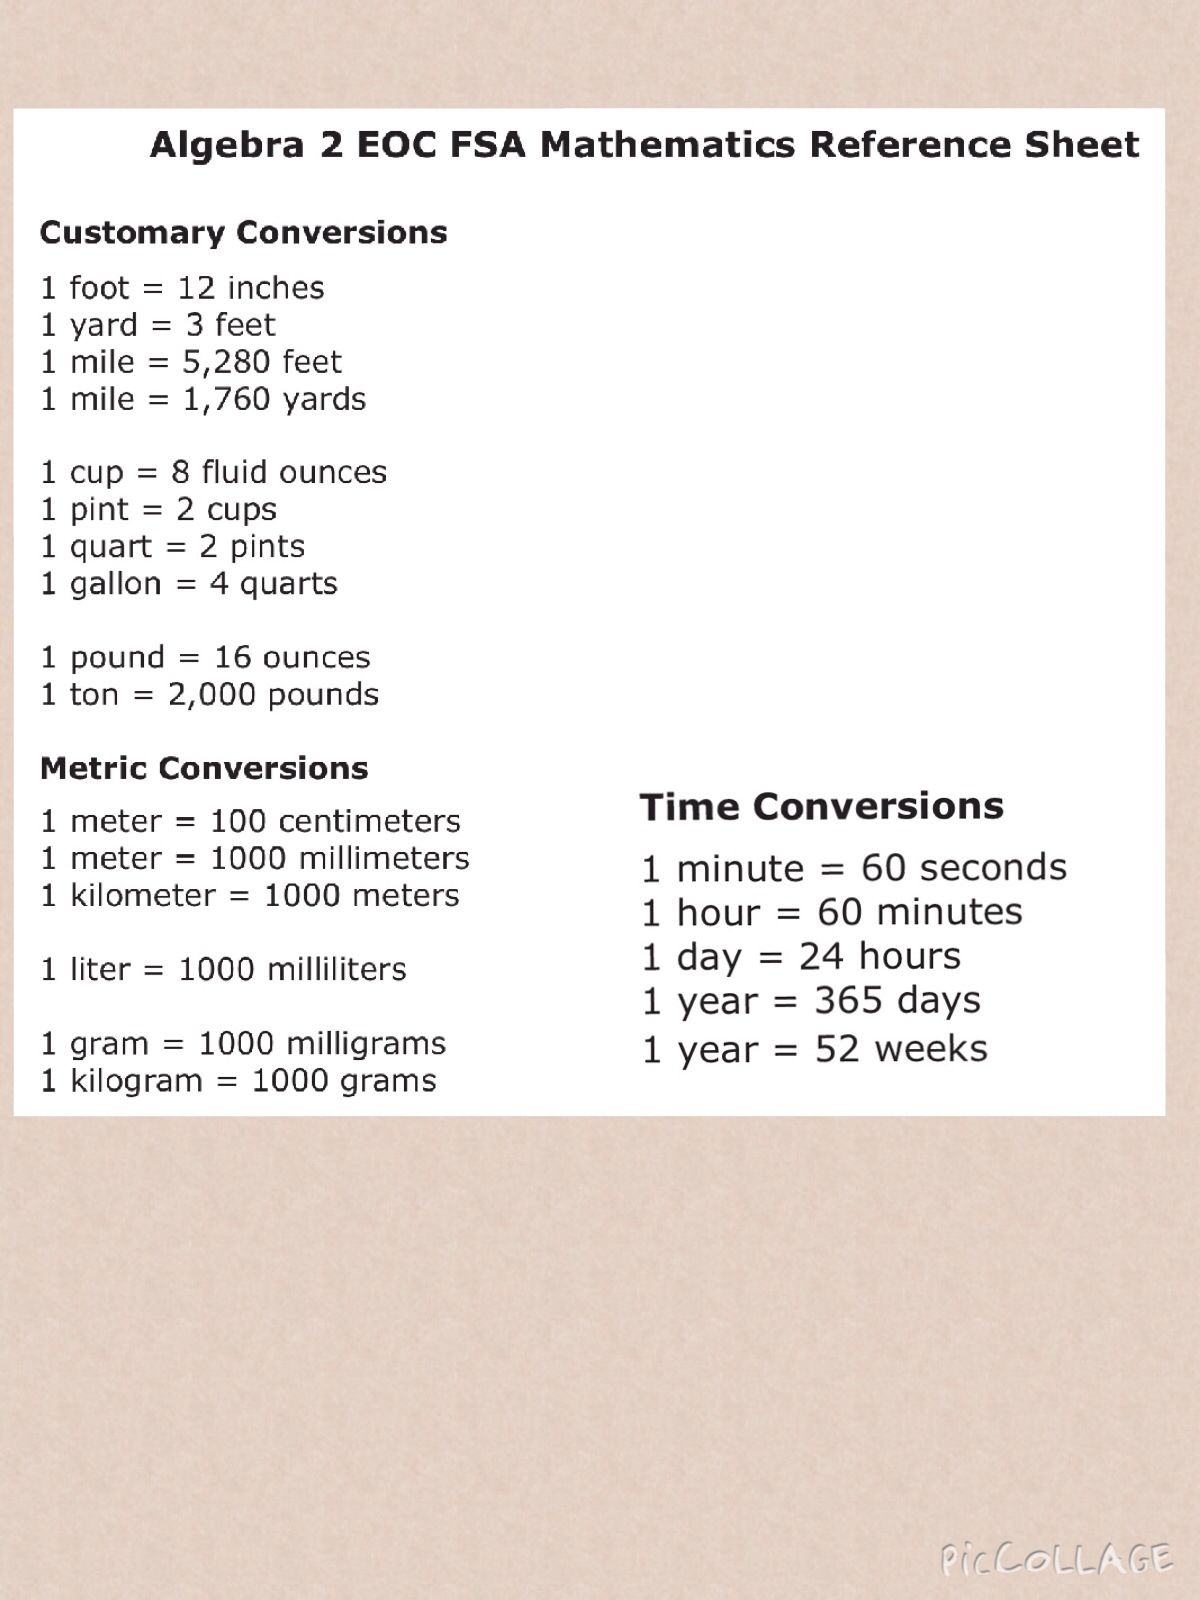 EOC FSA Alg2 Math Ref Sheet   Real life math [ 1600 x 1200 Pixel ]